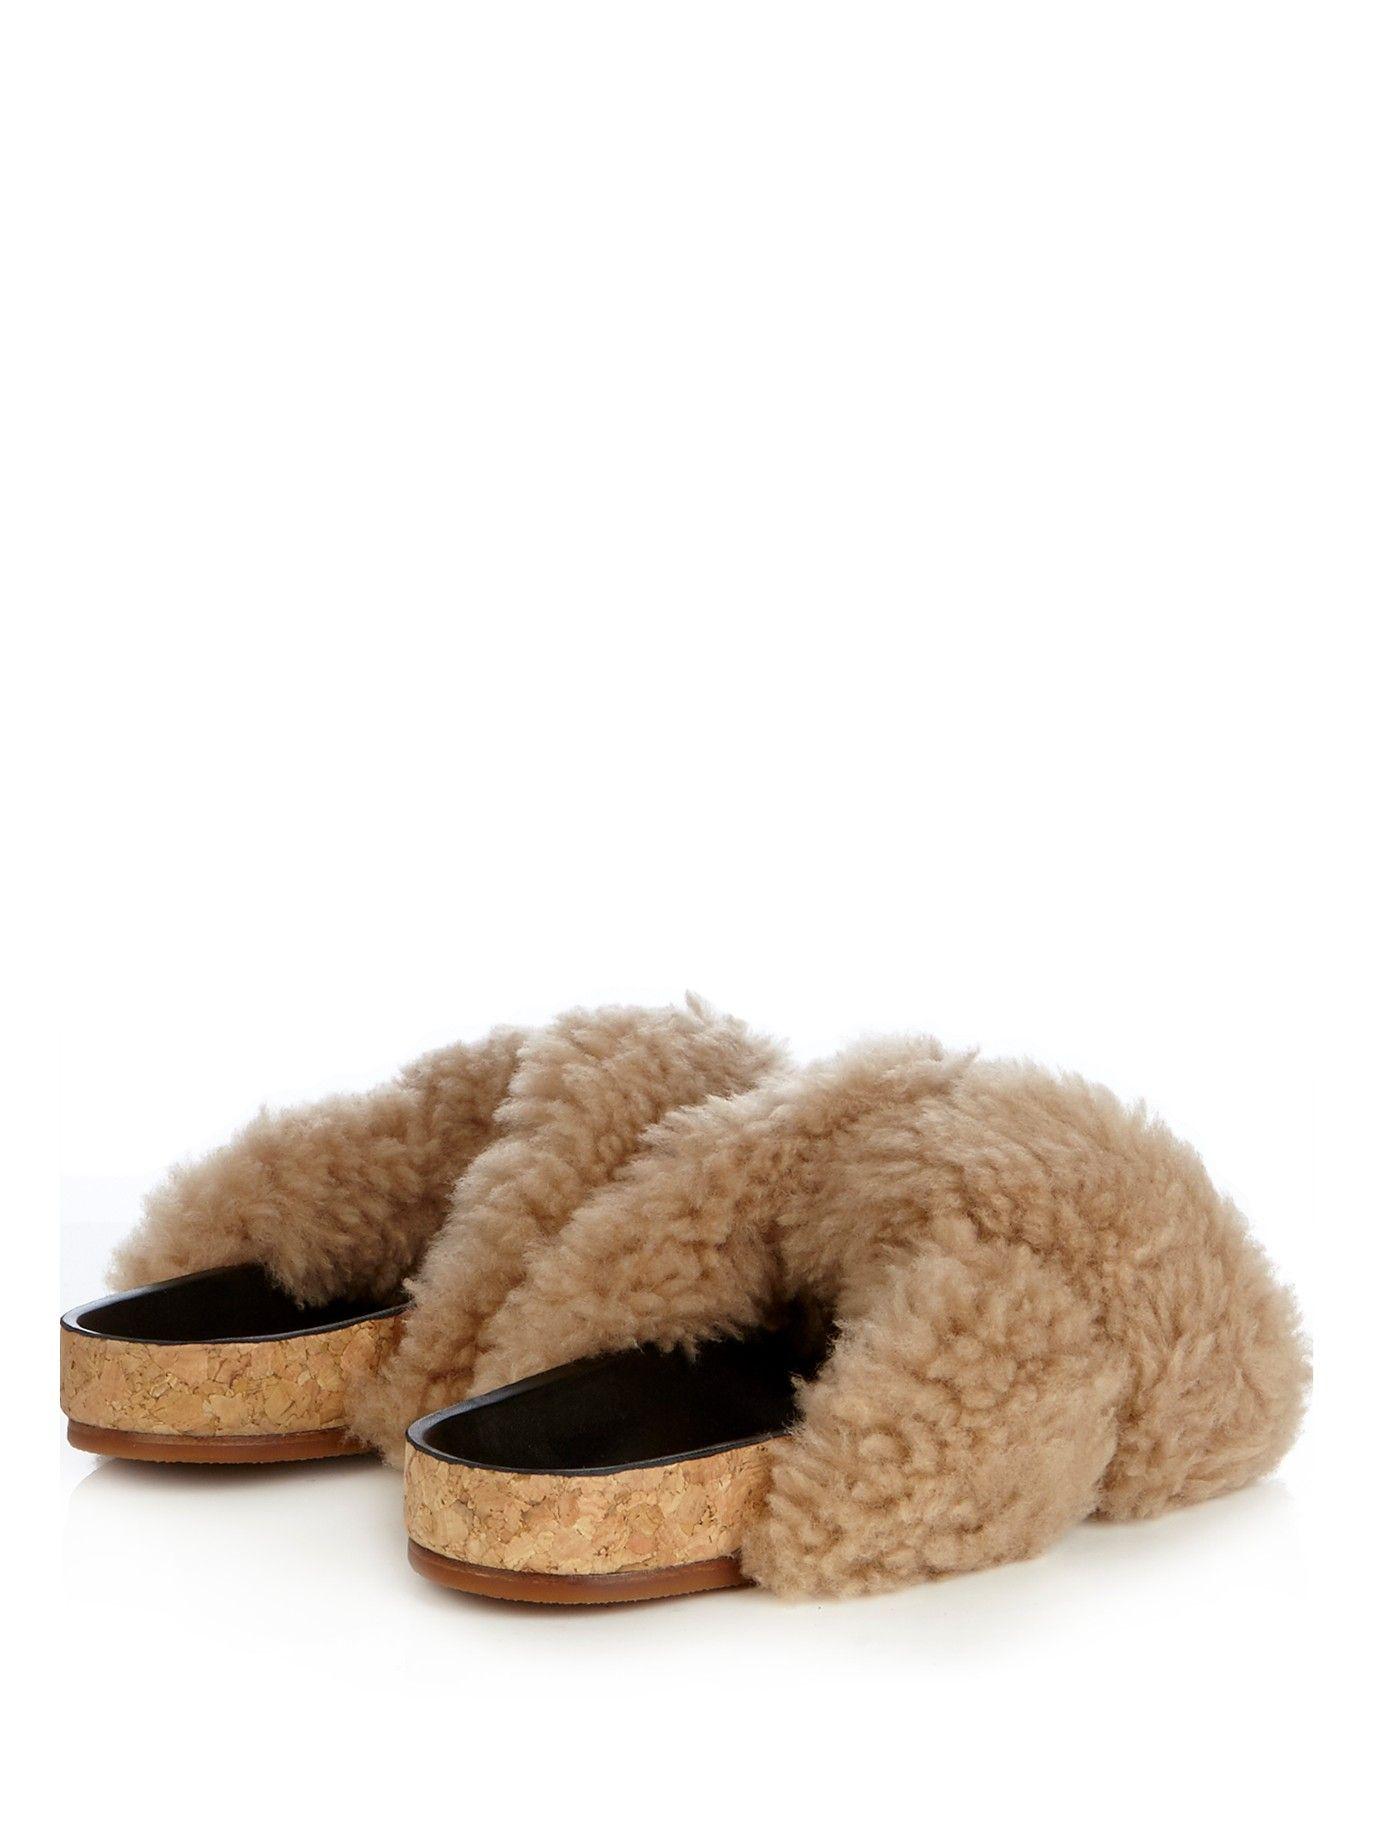 Kerenn shearling flat sandals   Chloé